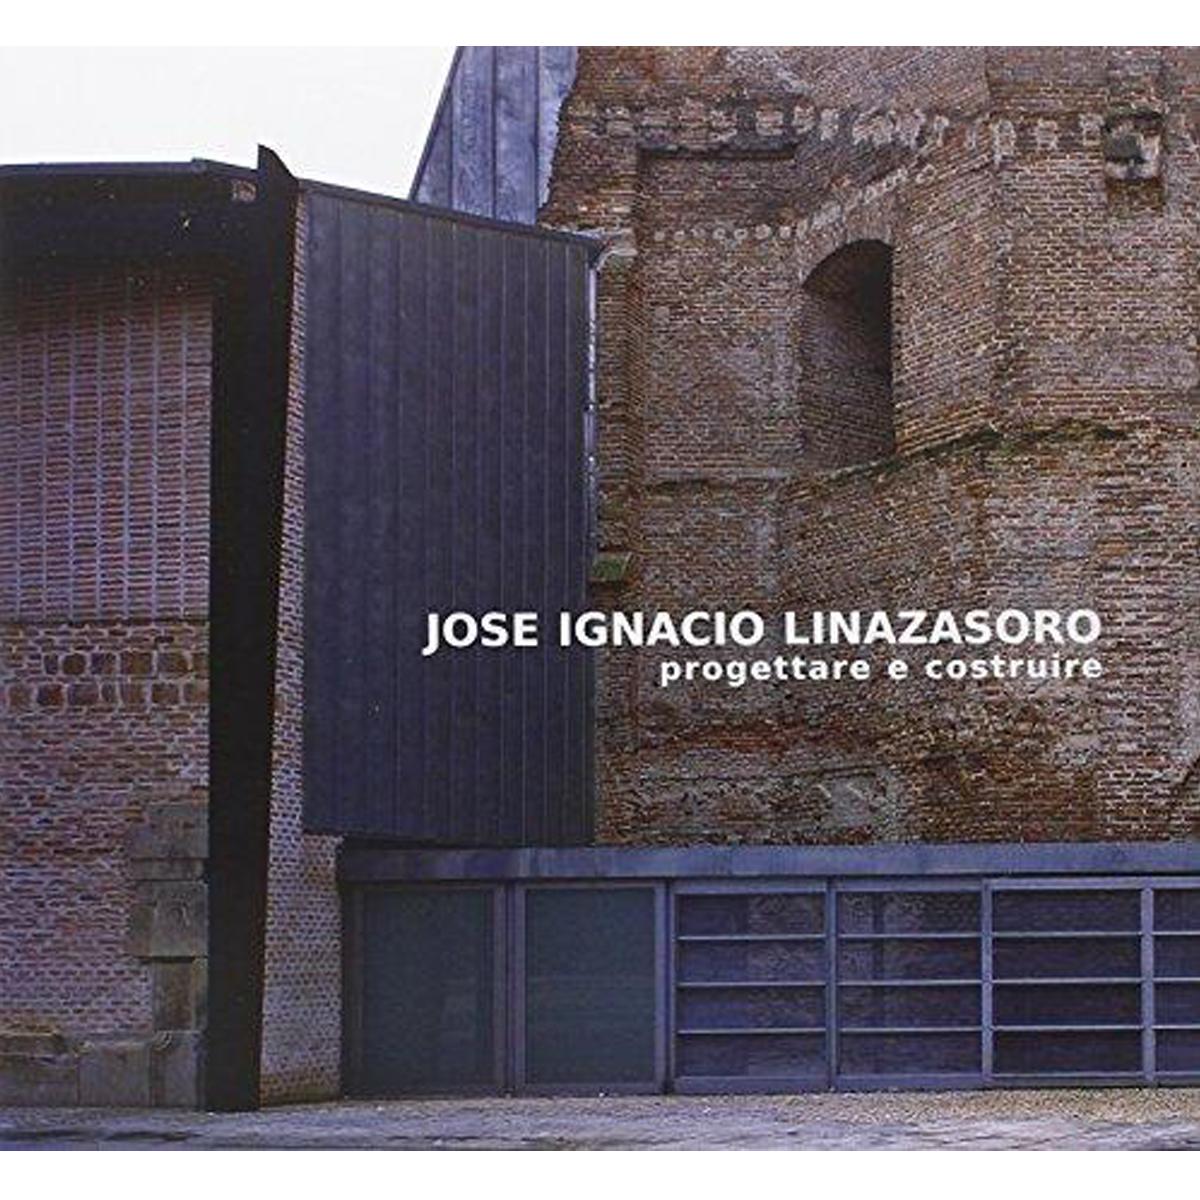 José Ignacio Linazasoro